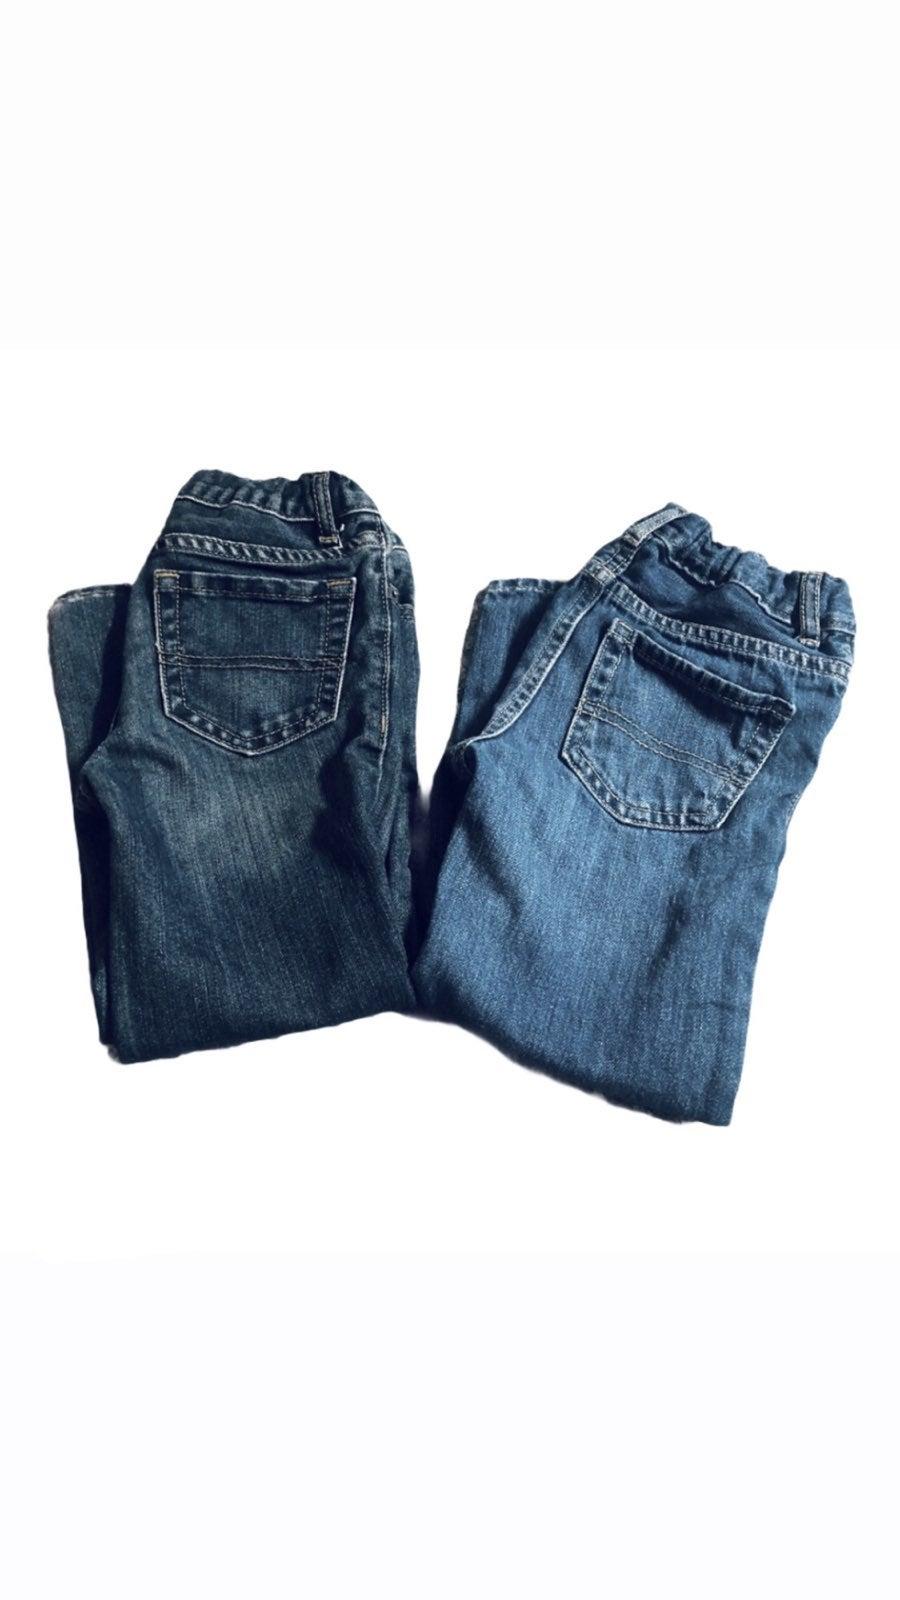 Toddler Jeans pair